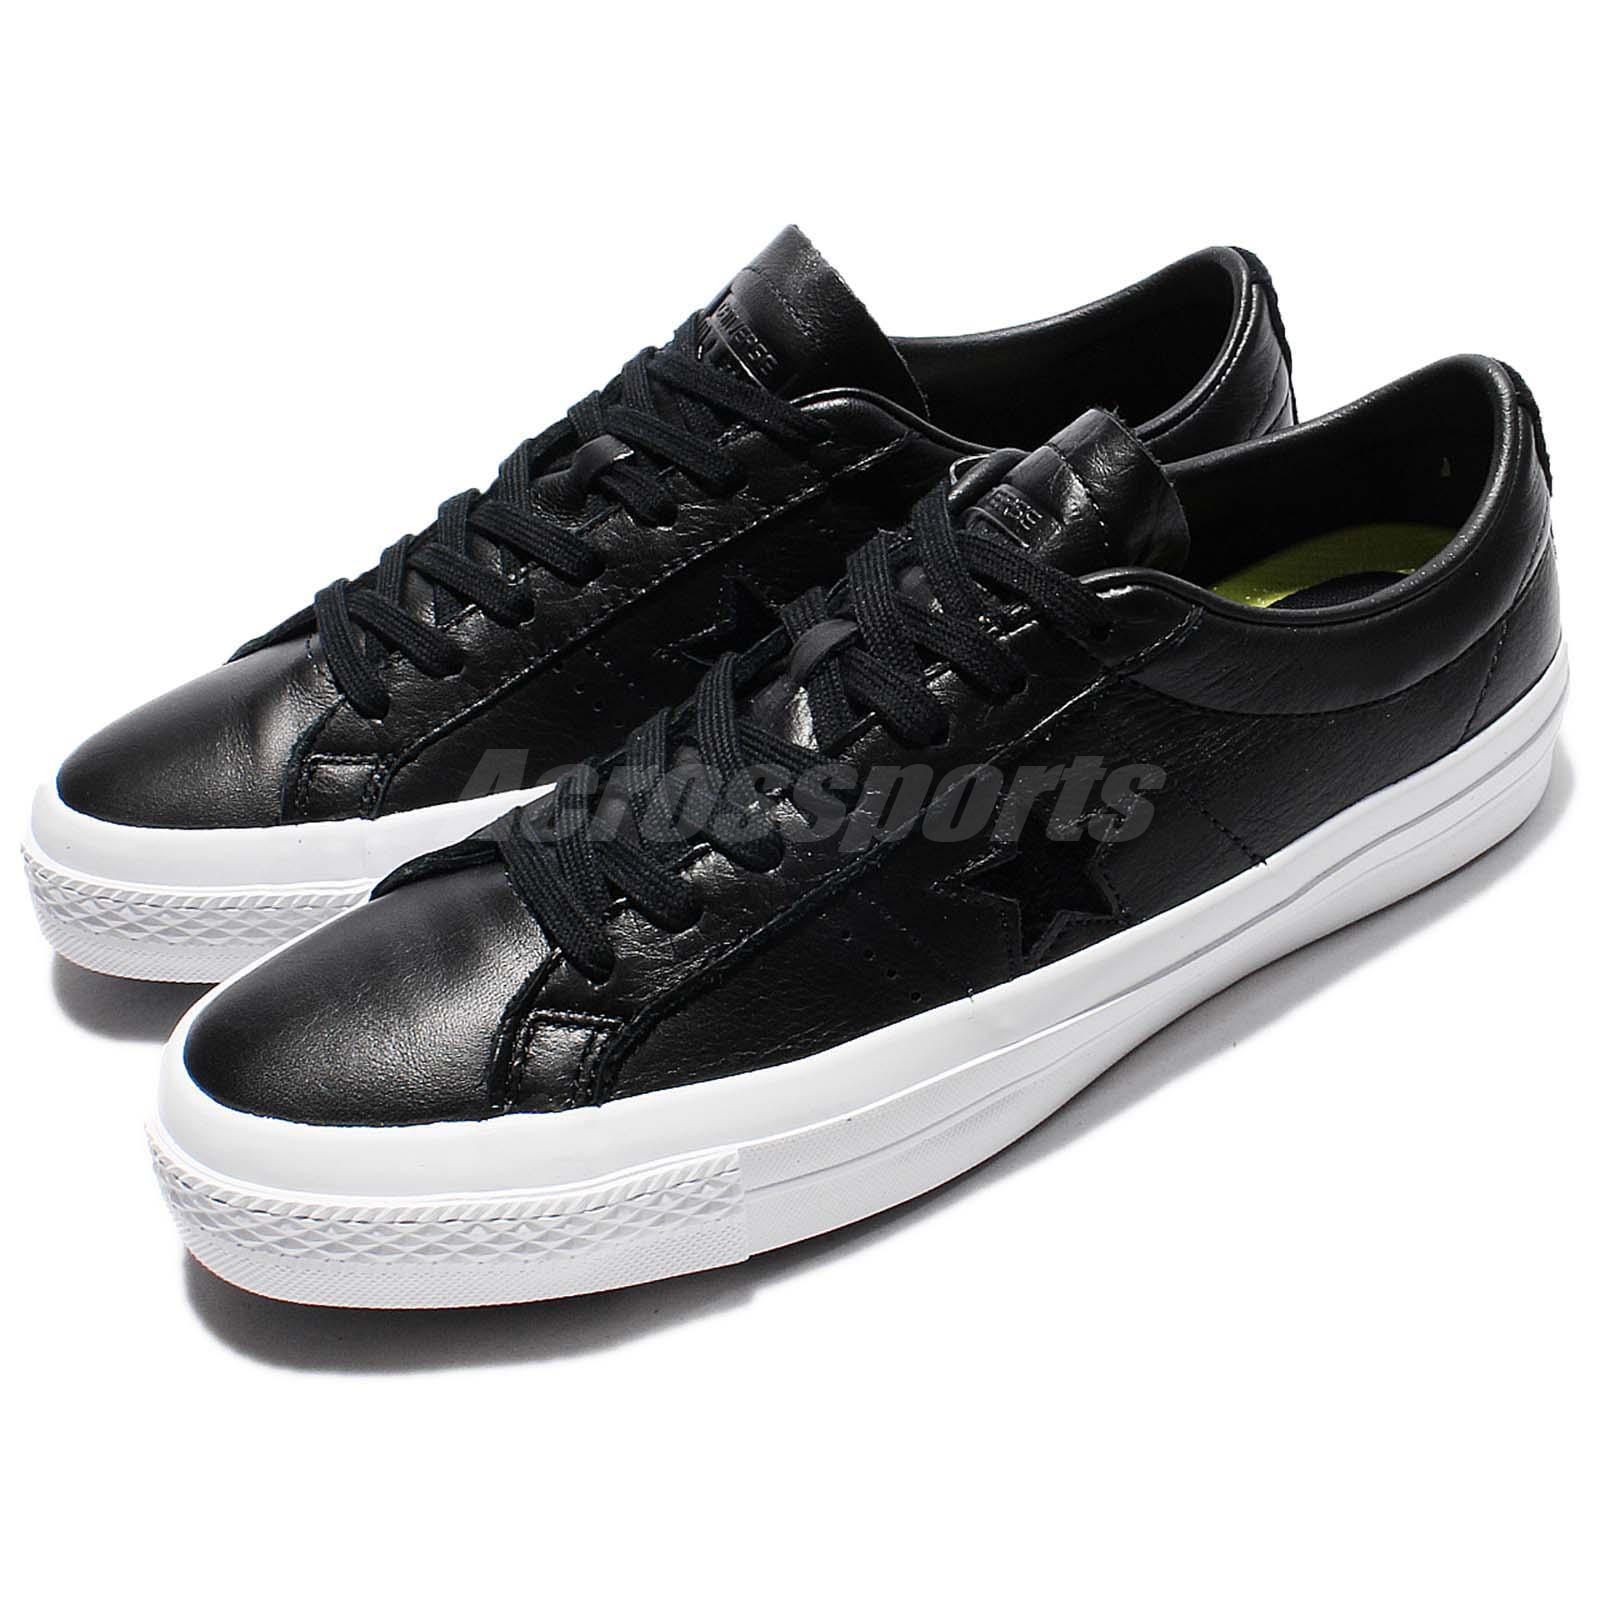 Converse One Star Premium Leather Low Top nero bianca Men Classic scarpe 155548C | The King Of Quantità  | Scolaro/Ragazze Scarpa